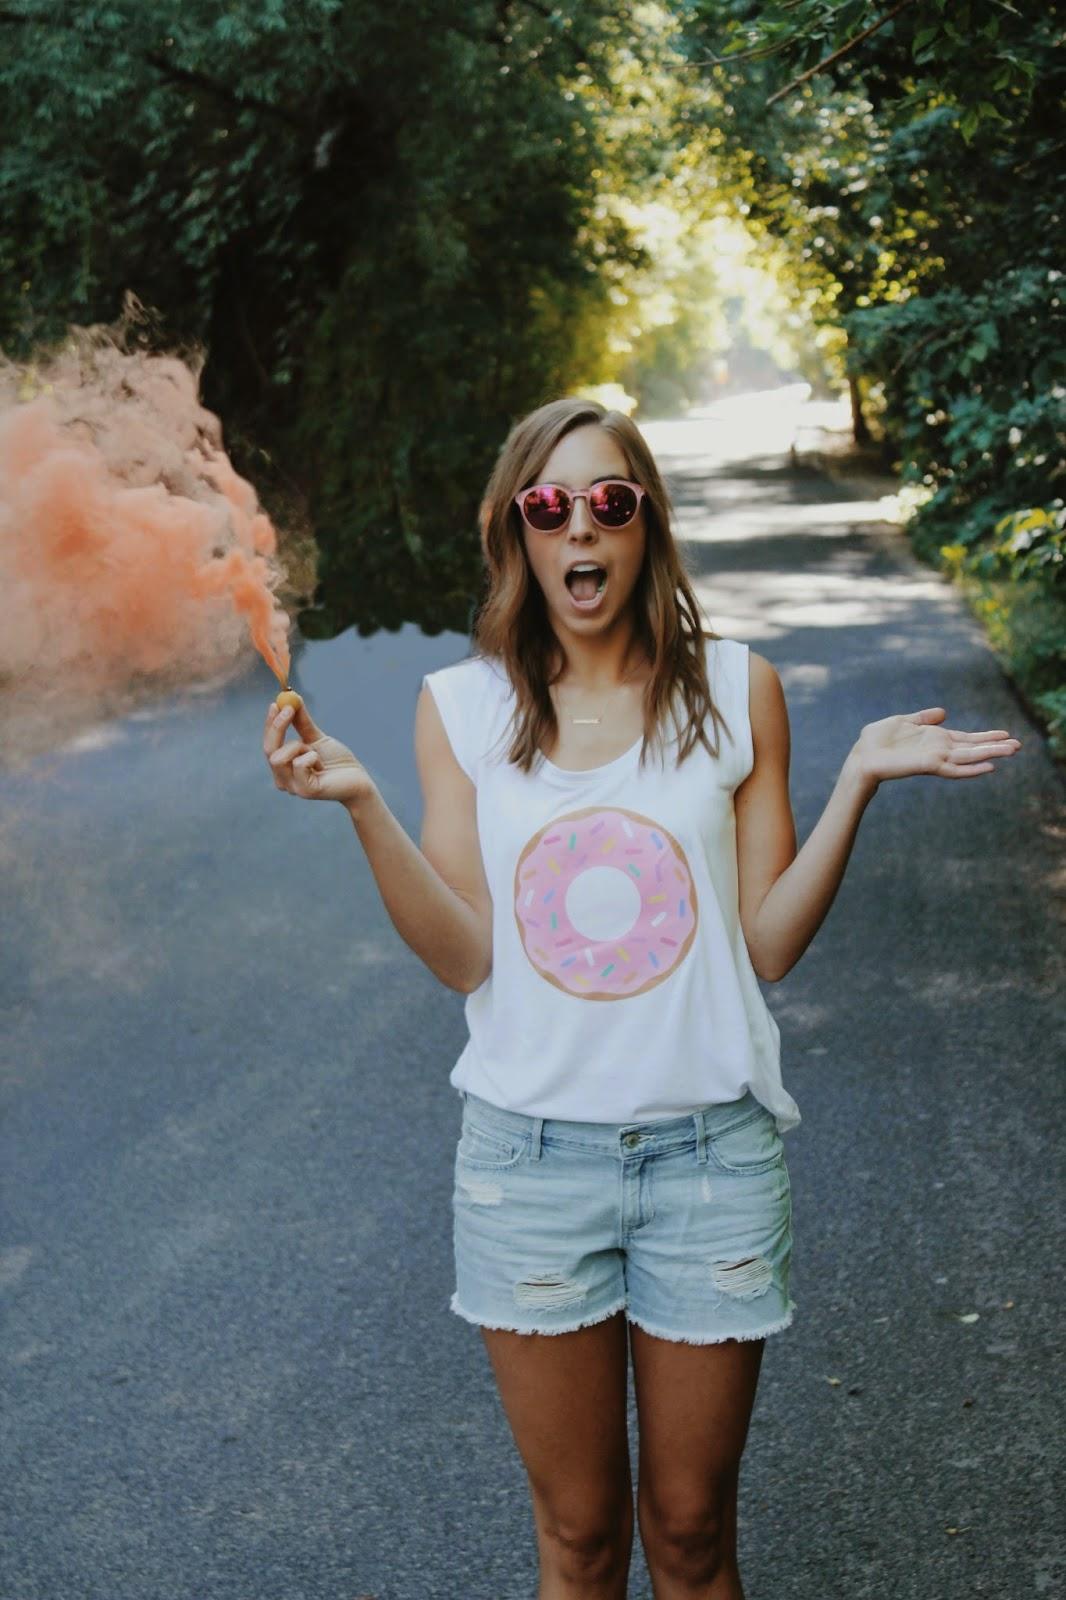 target, donut t shirt, jean cut offs, smoke bomb, girl, sun, donut, doughnut